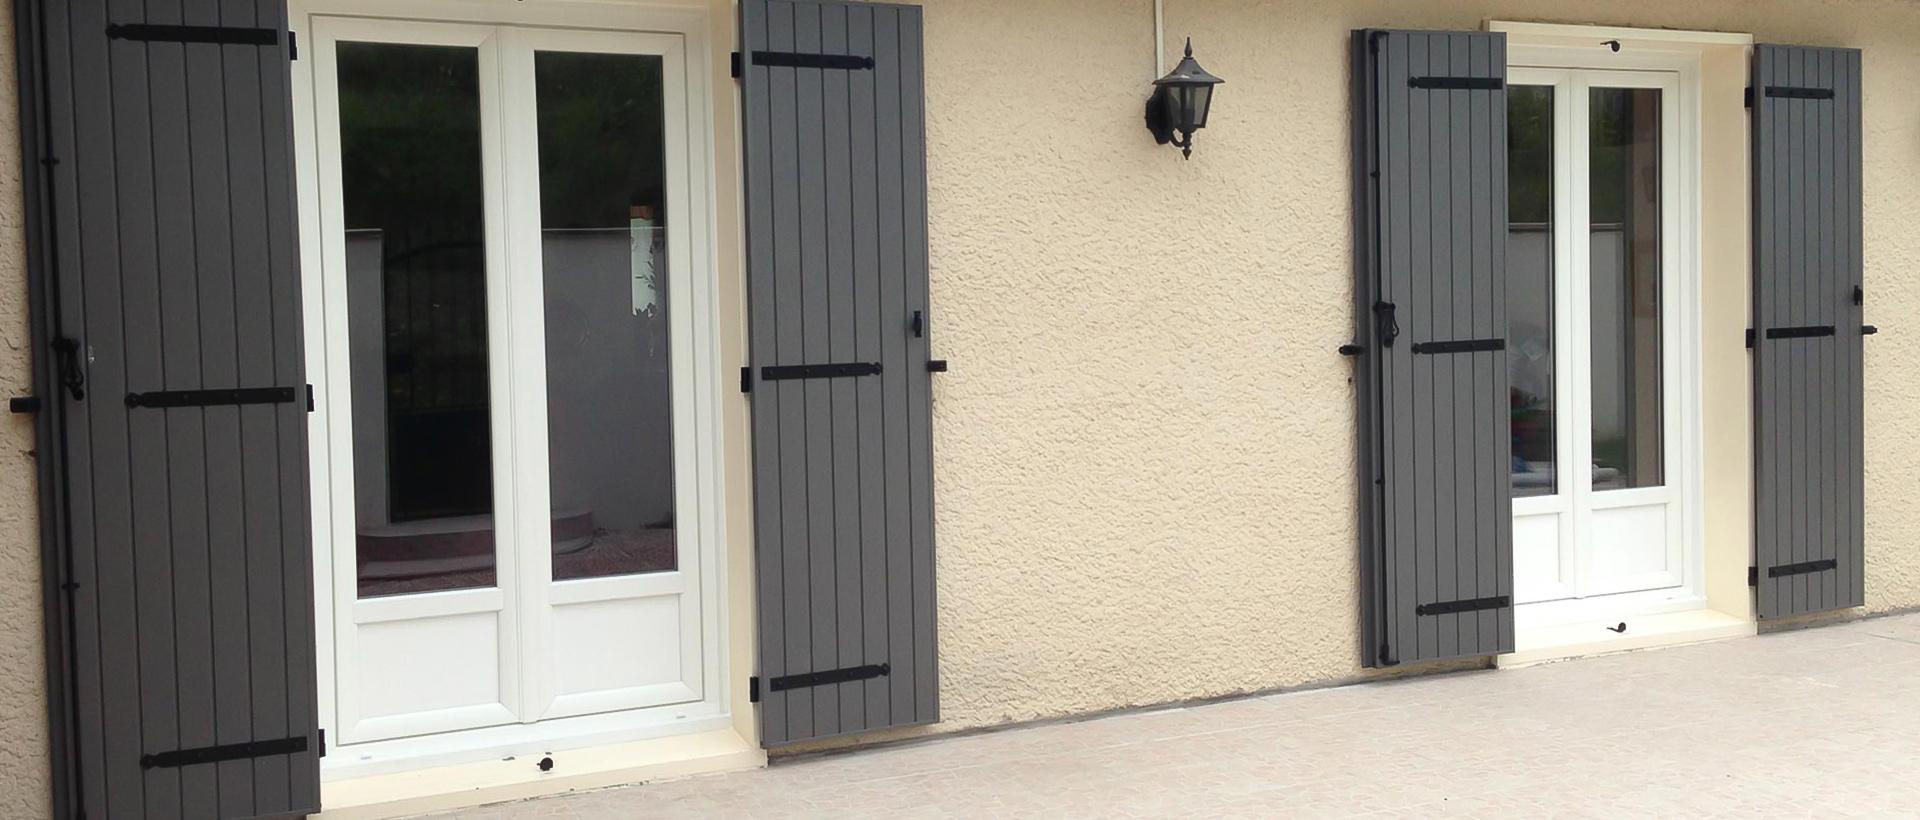 volets battant aluminium type apollon sib mvm. Black Bedroom Furniture Sets. Home Design Ideas